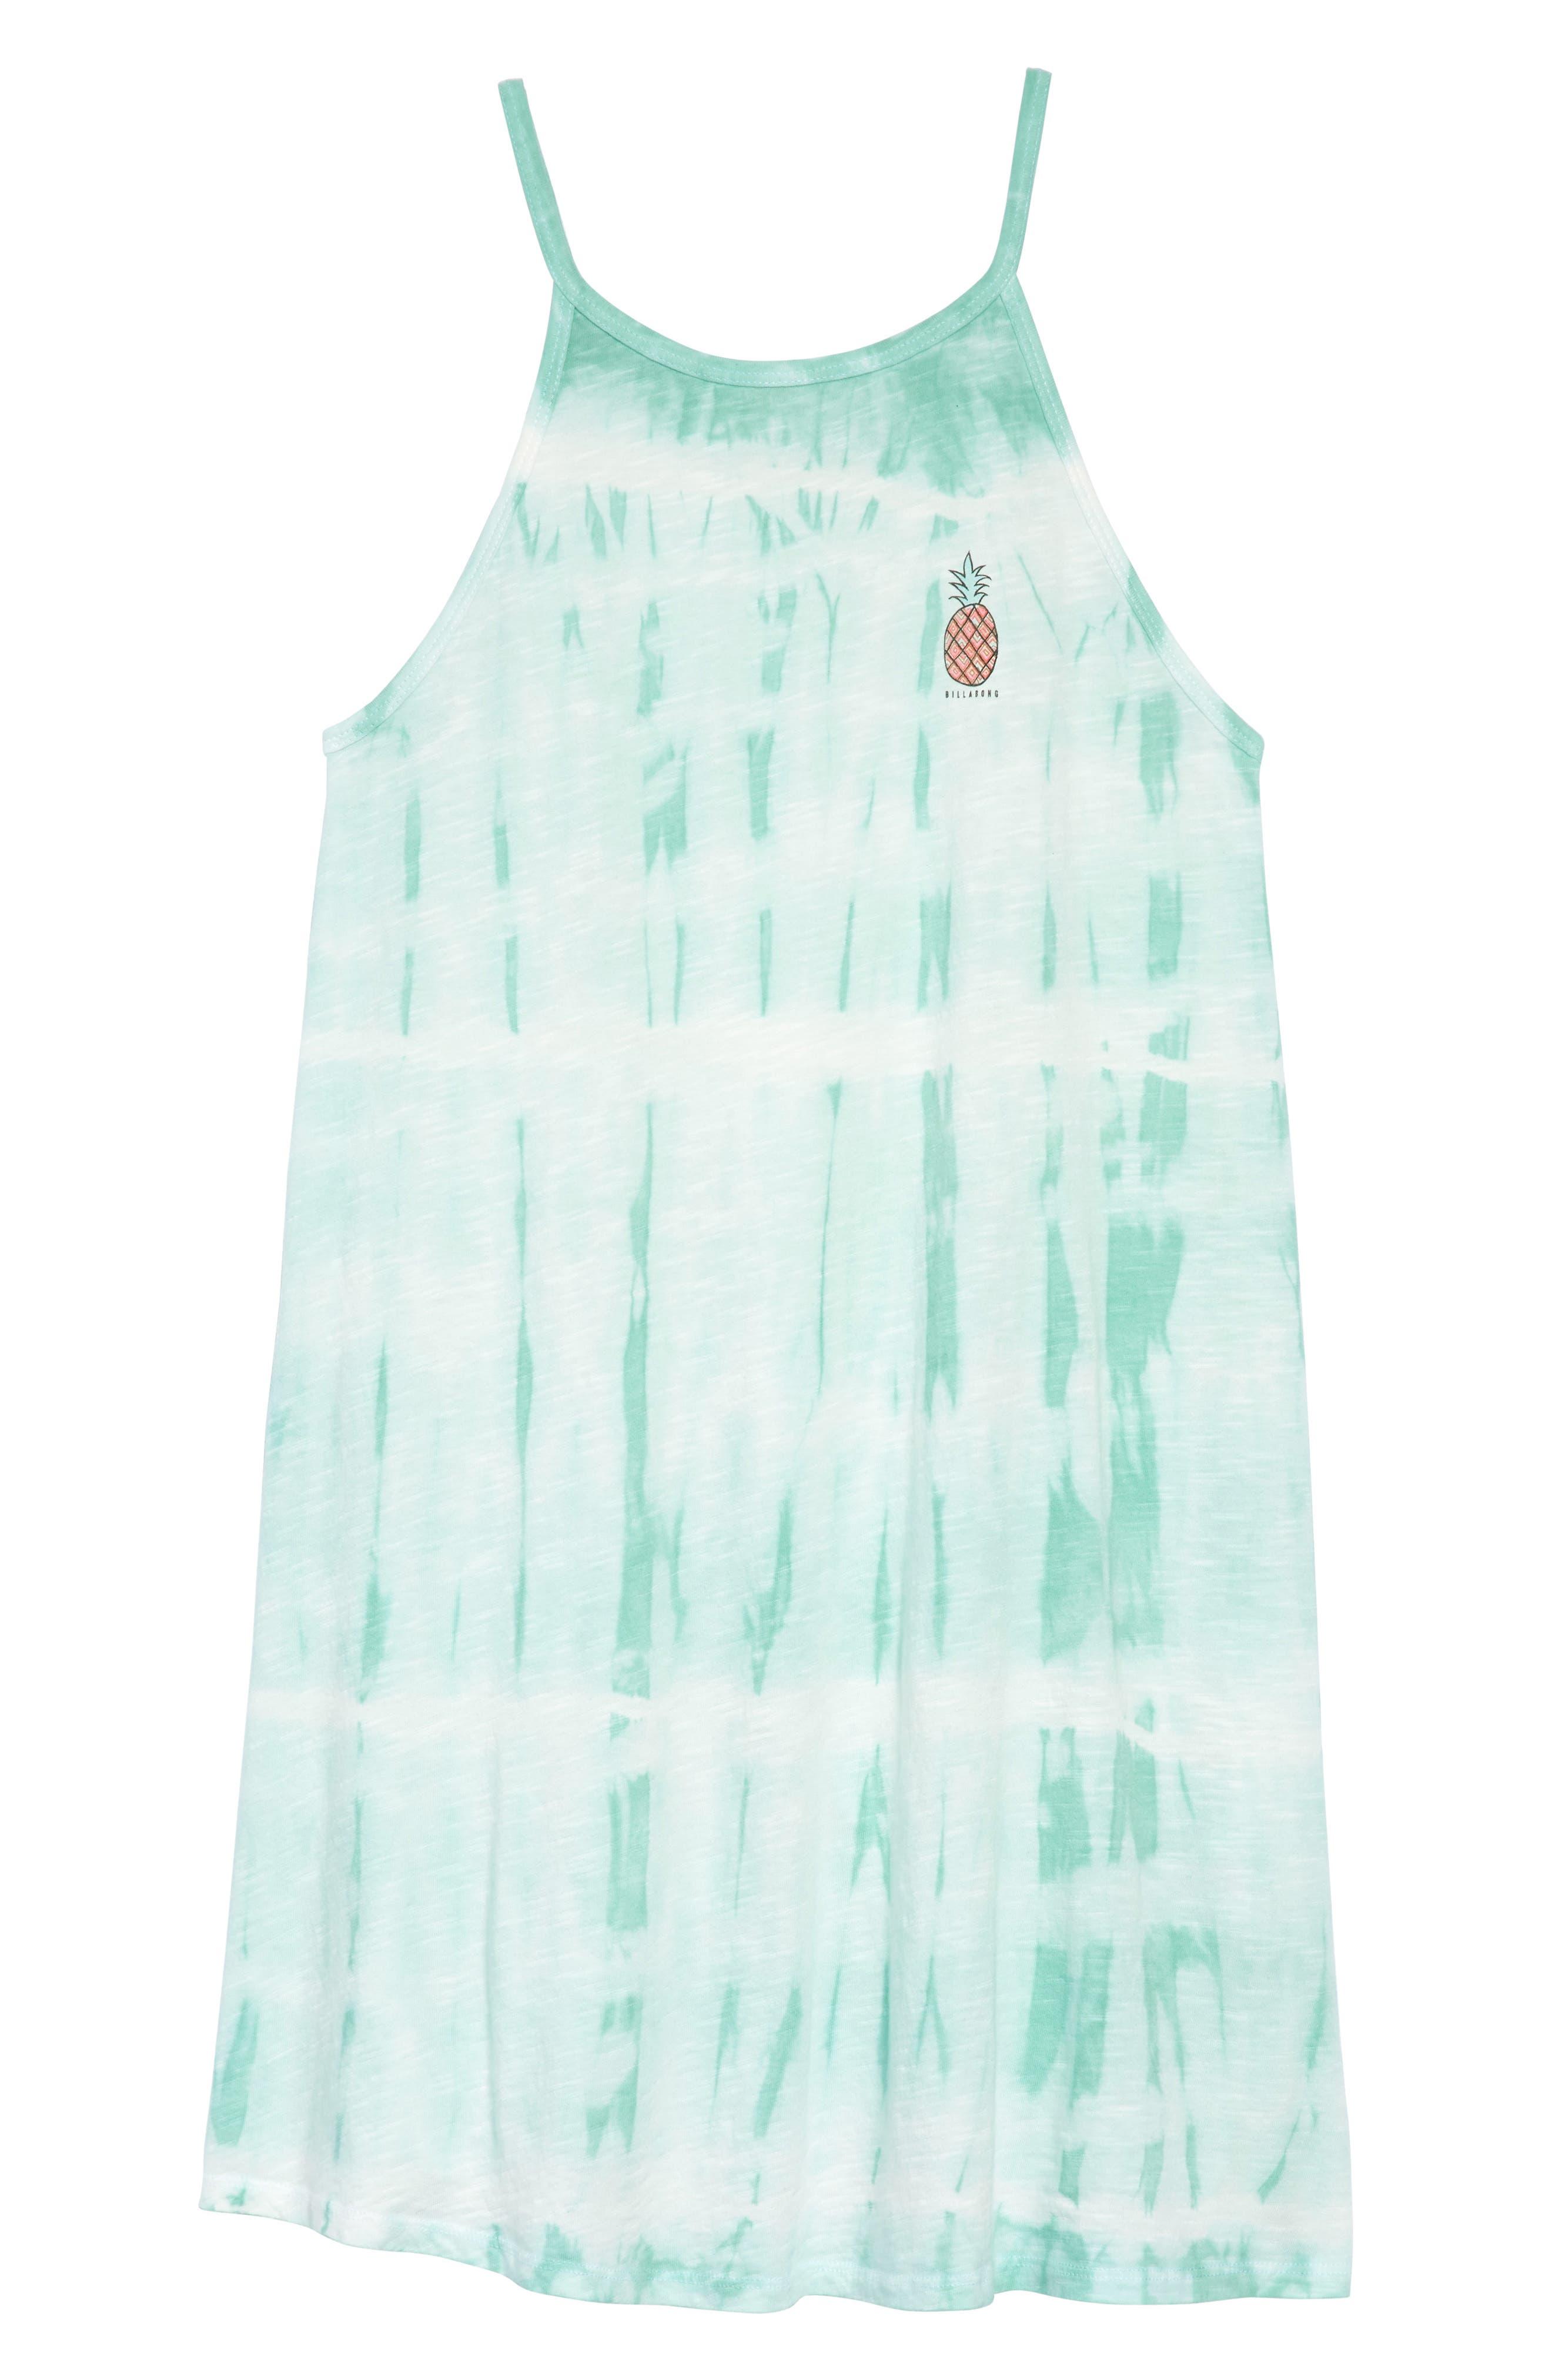 BILLABONG,                             Namaste All Day Tie-Dye Dress,                             Main thumbnail 1, color,                             414